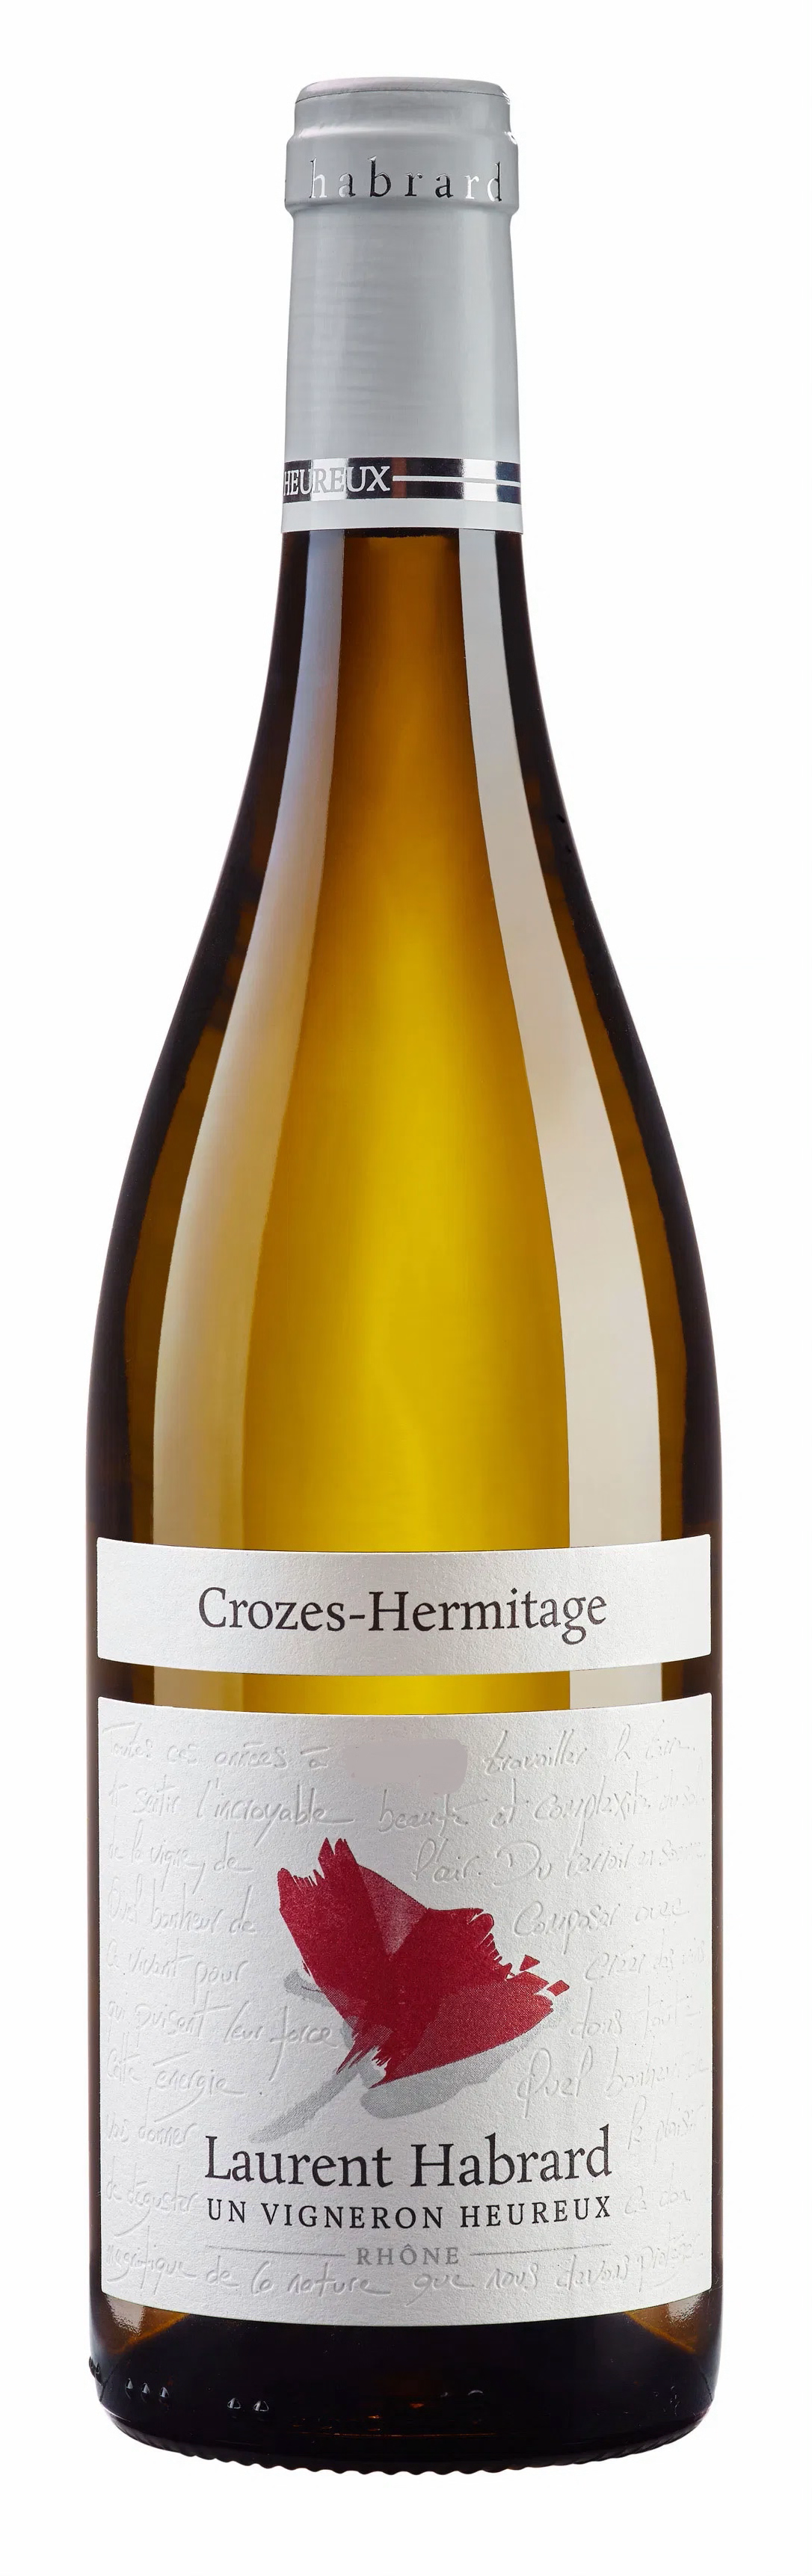 2017 Domaine Laurent Habrard, Crozes-Hermitage Blanc